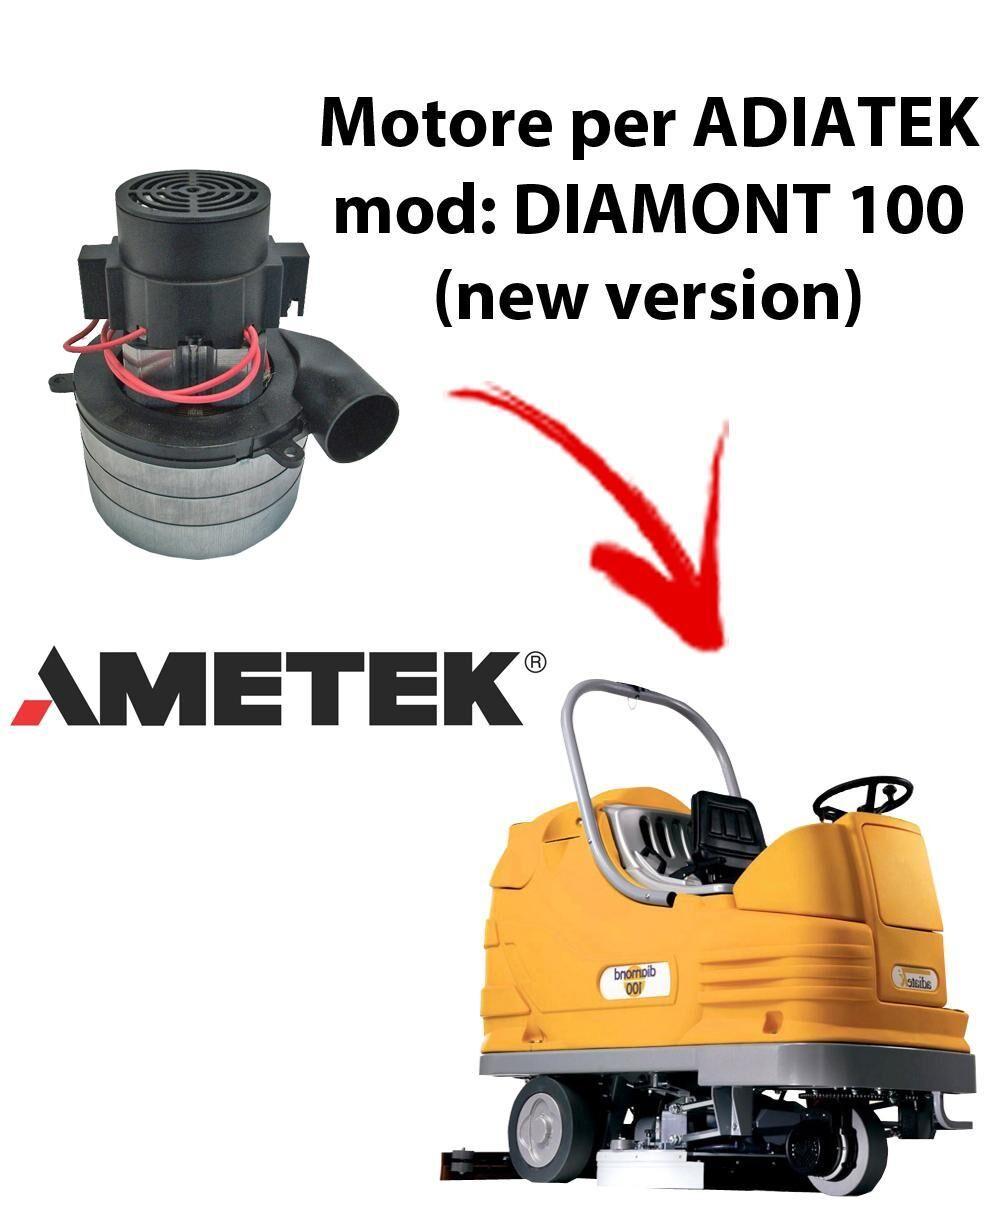 adiatek diamond 100 (new version) motore aspirazione ametek italia per lavapavimenti